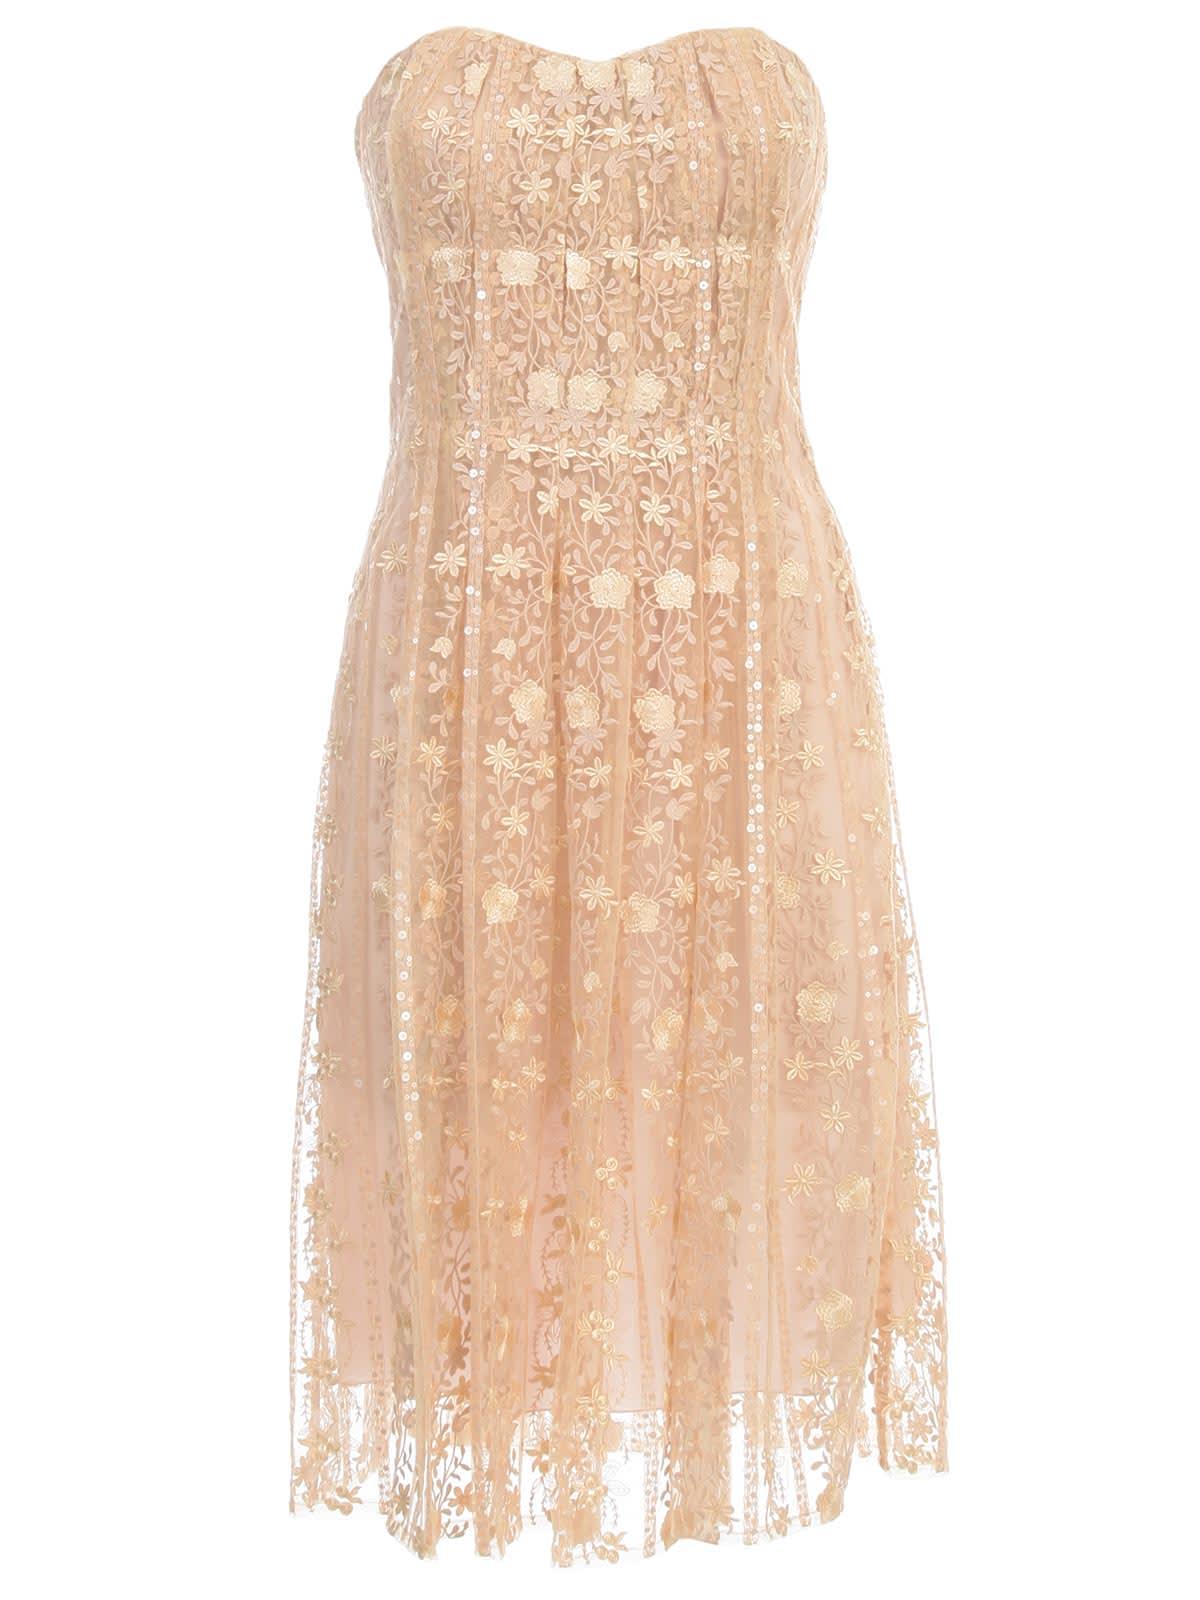 Buy Blumarine Bustier Dress W/s W/lace online, shop Blumarine with free shipping